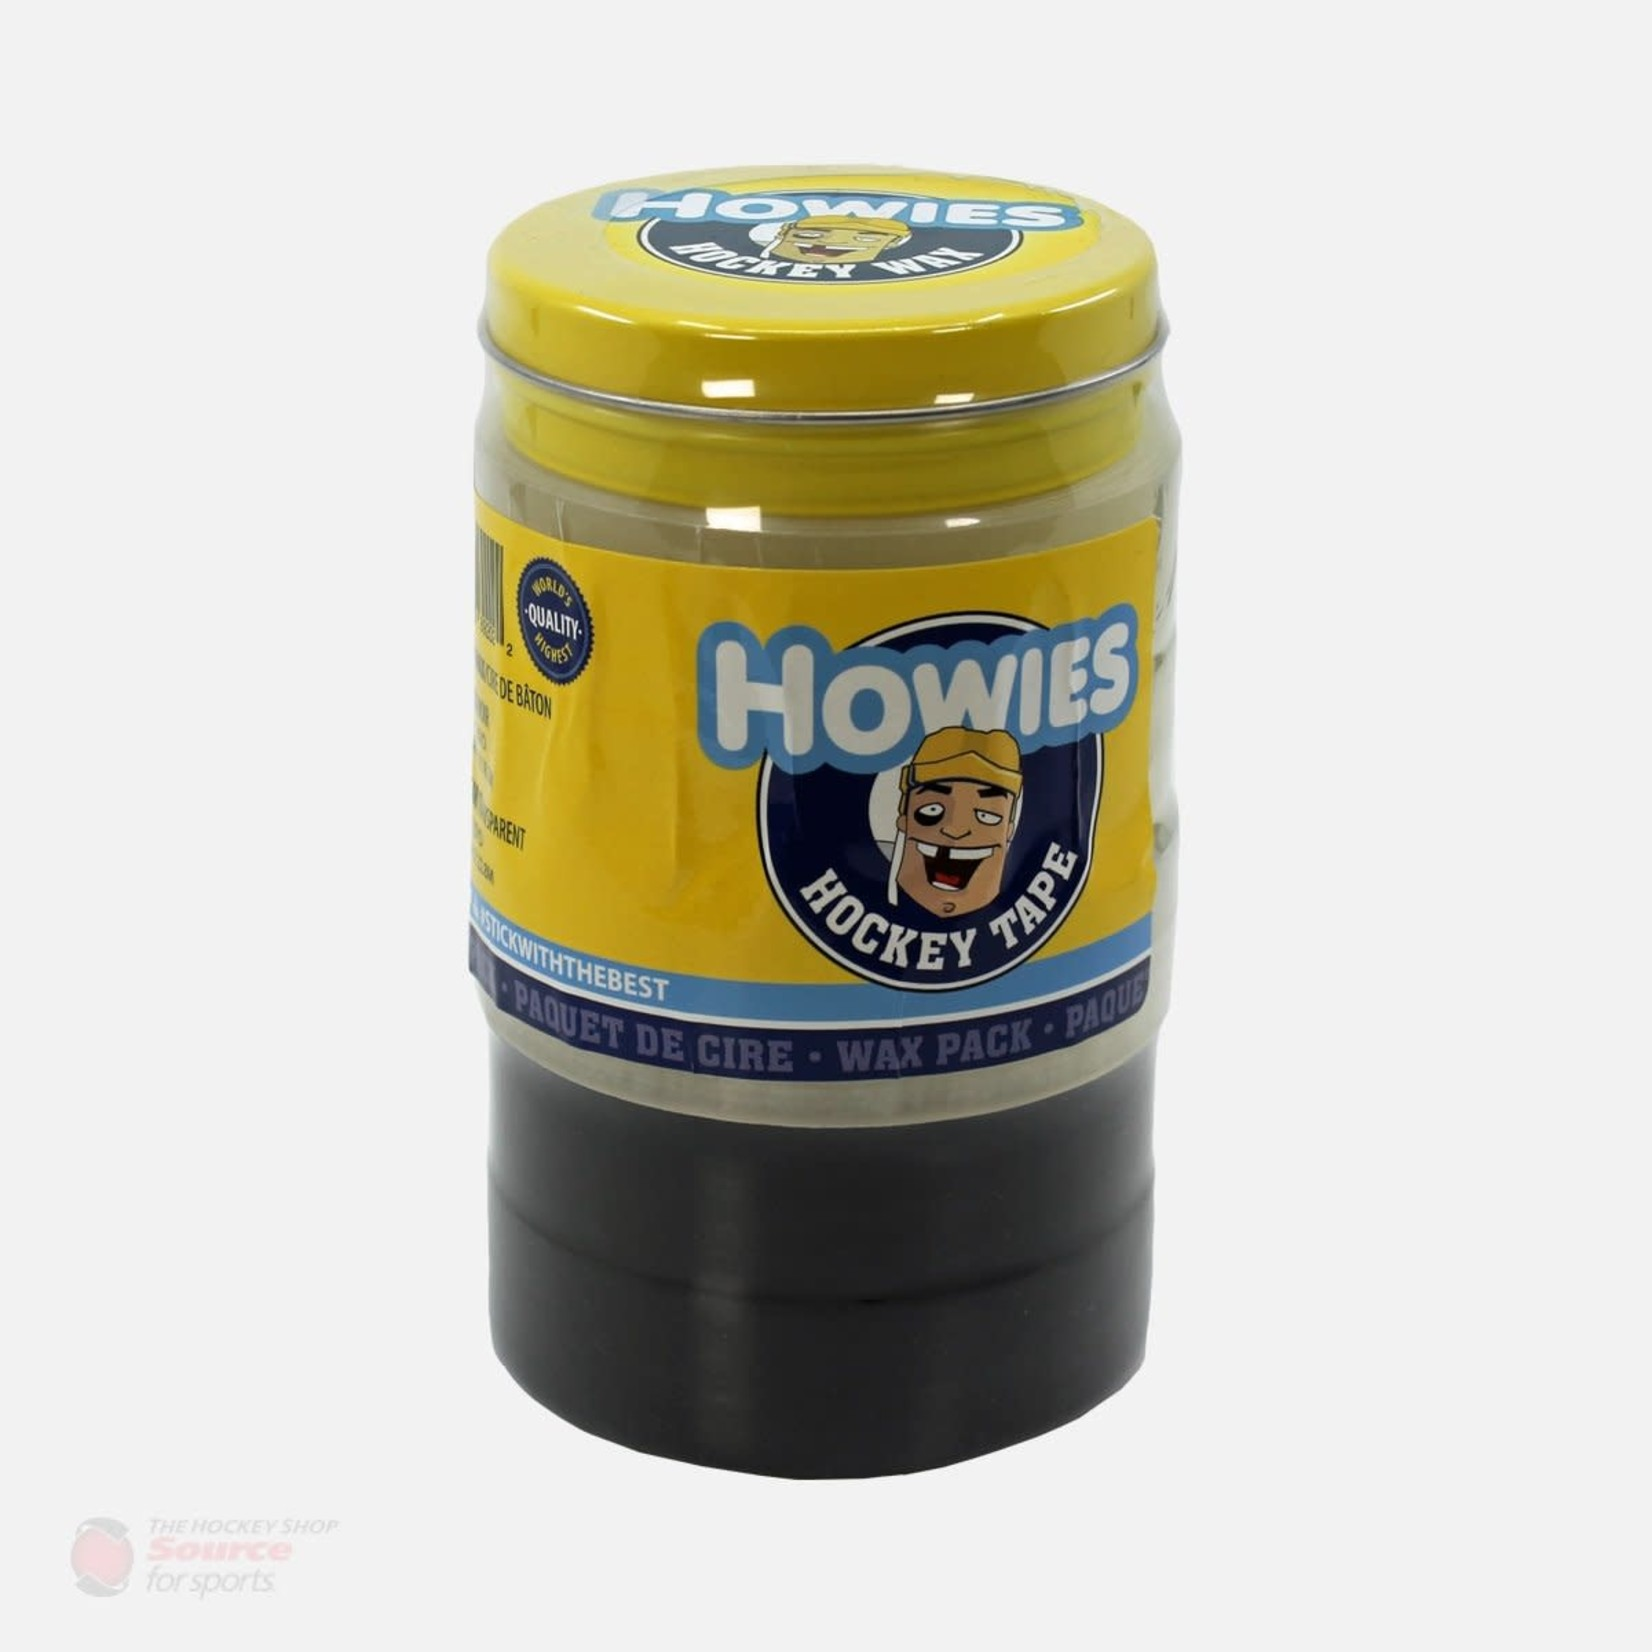 Howies Howies Wax Pack, 3 Clr/2 Blk/1 Wax